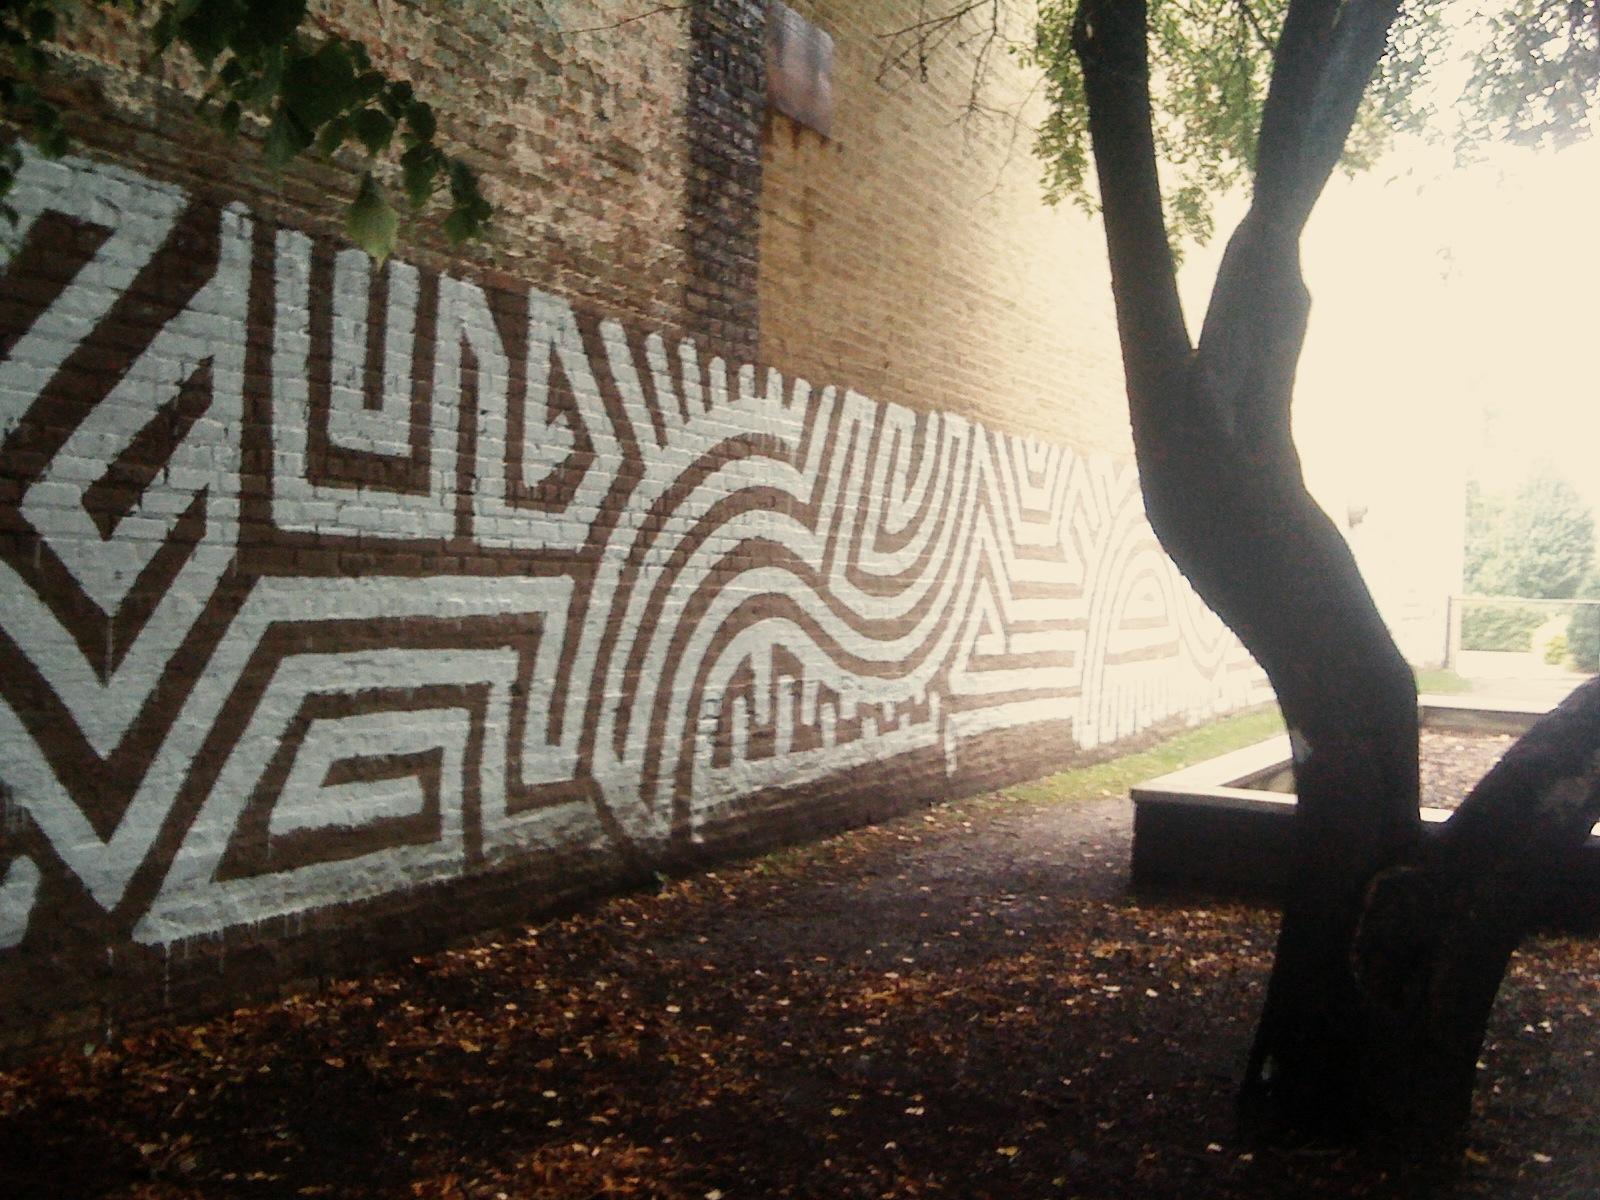 I like how the curves of Mental312's graffiti mimics the curve of the tree